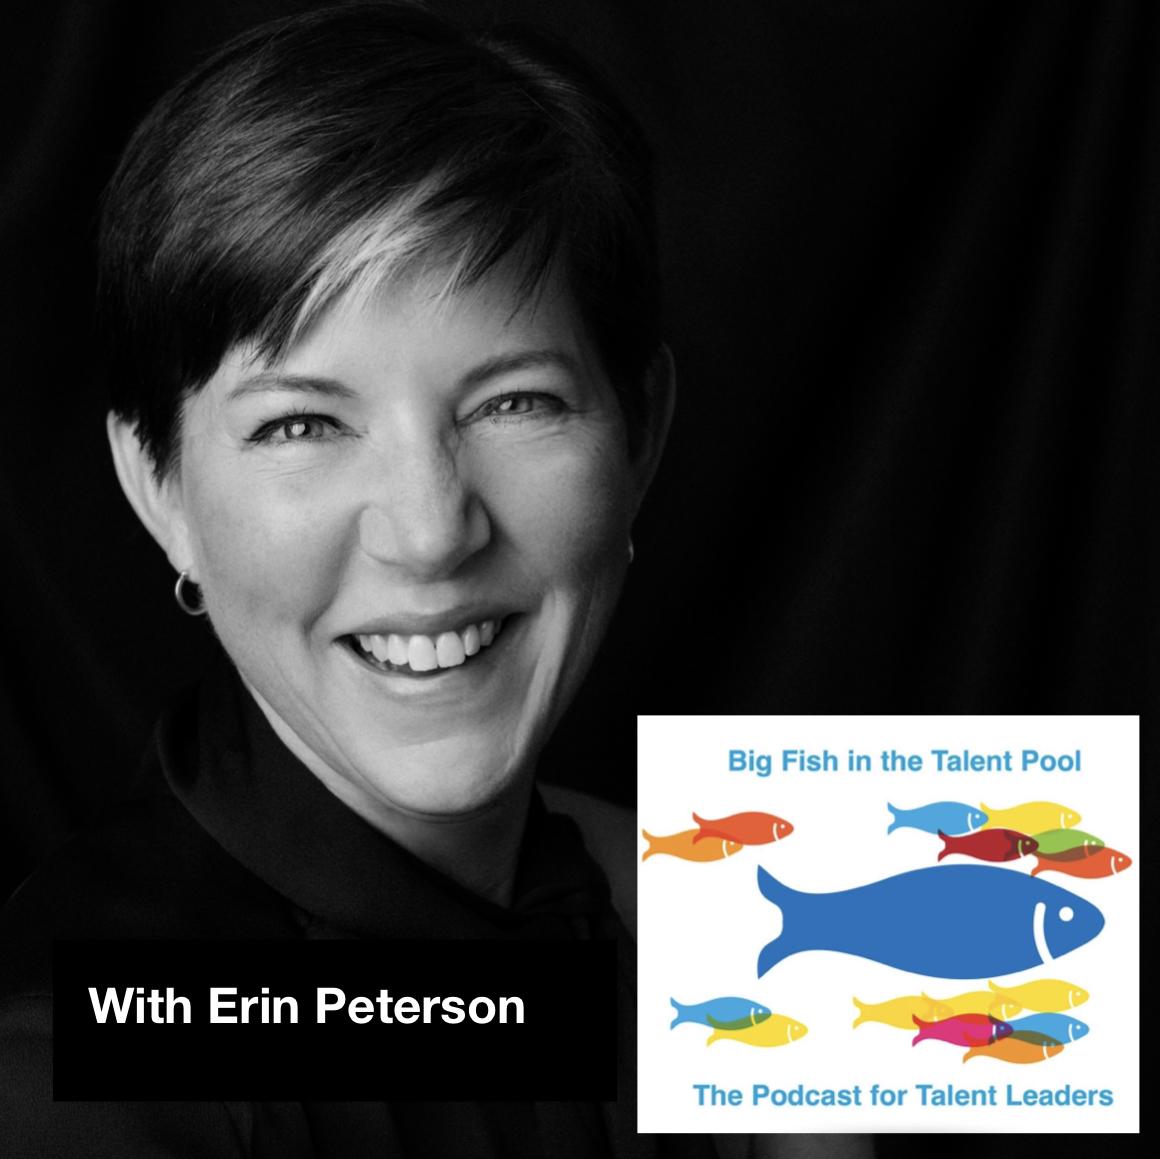 Big Fish in the Talent Pool